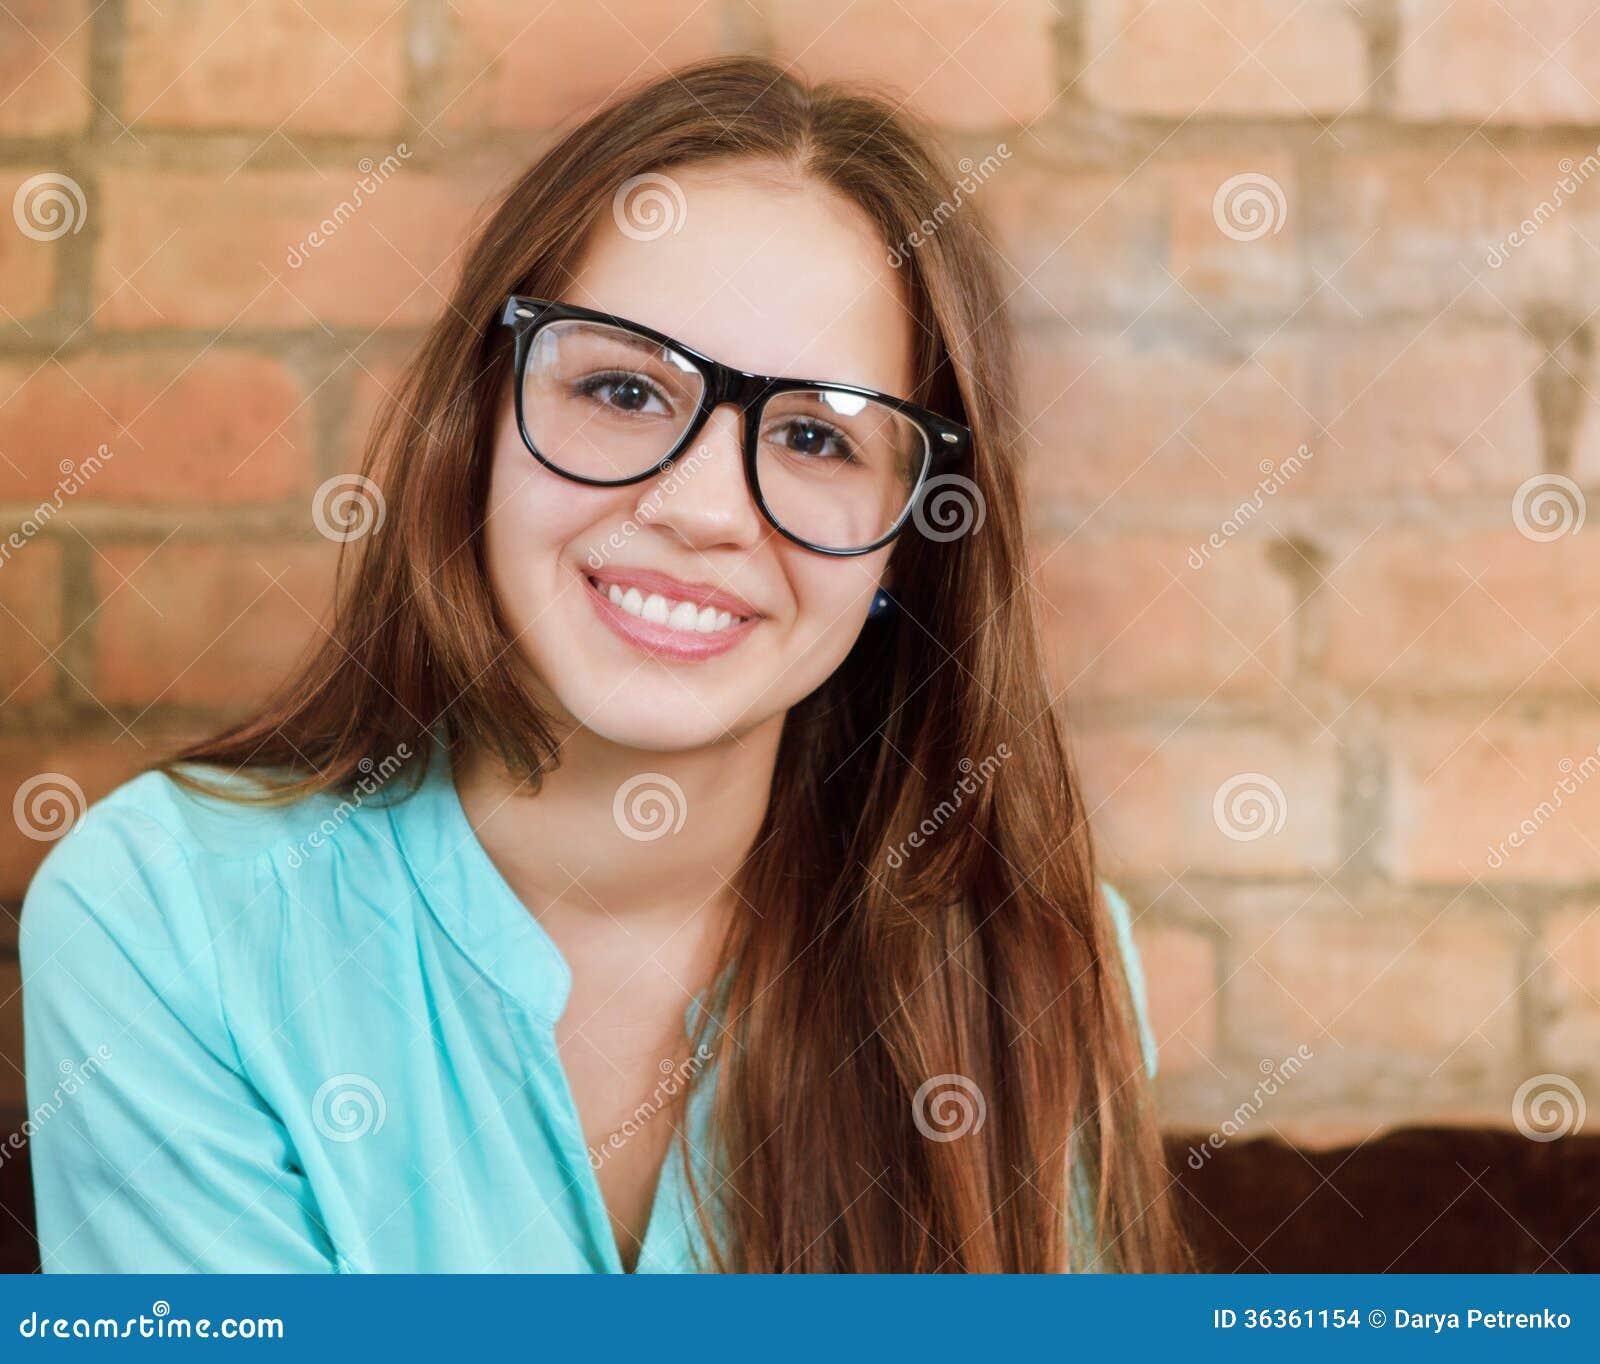 nice-closeup-of-a-teenage-girl